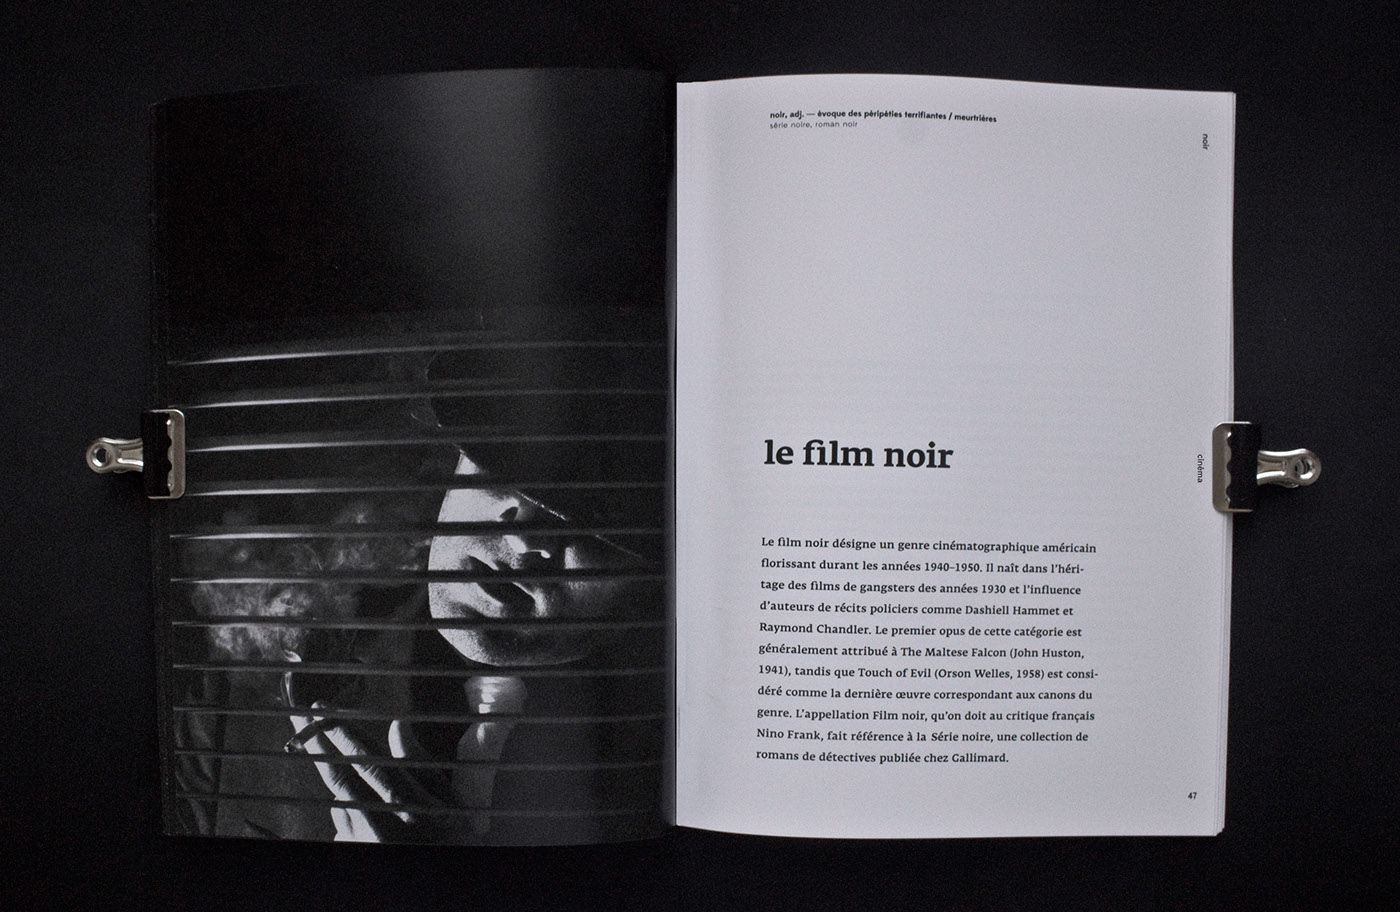 noir magazine edition black and white gradient